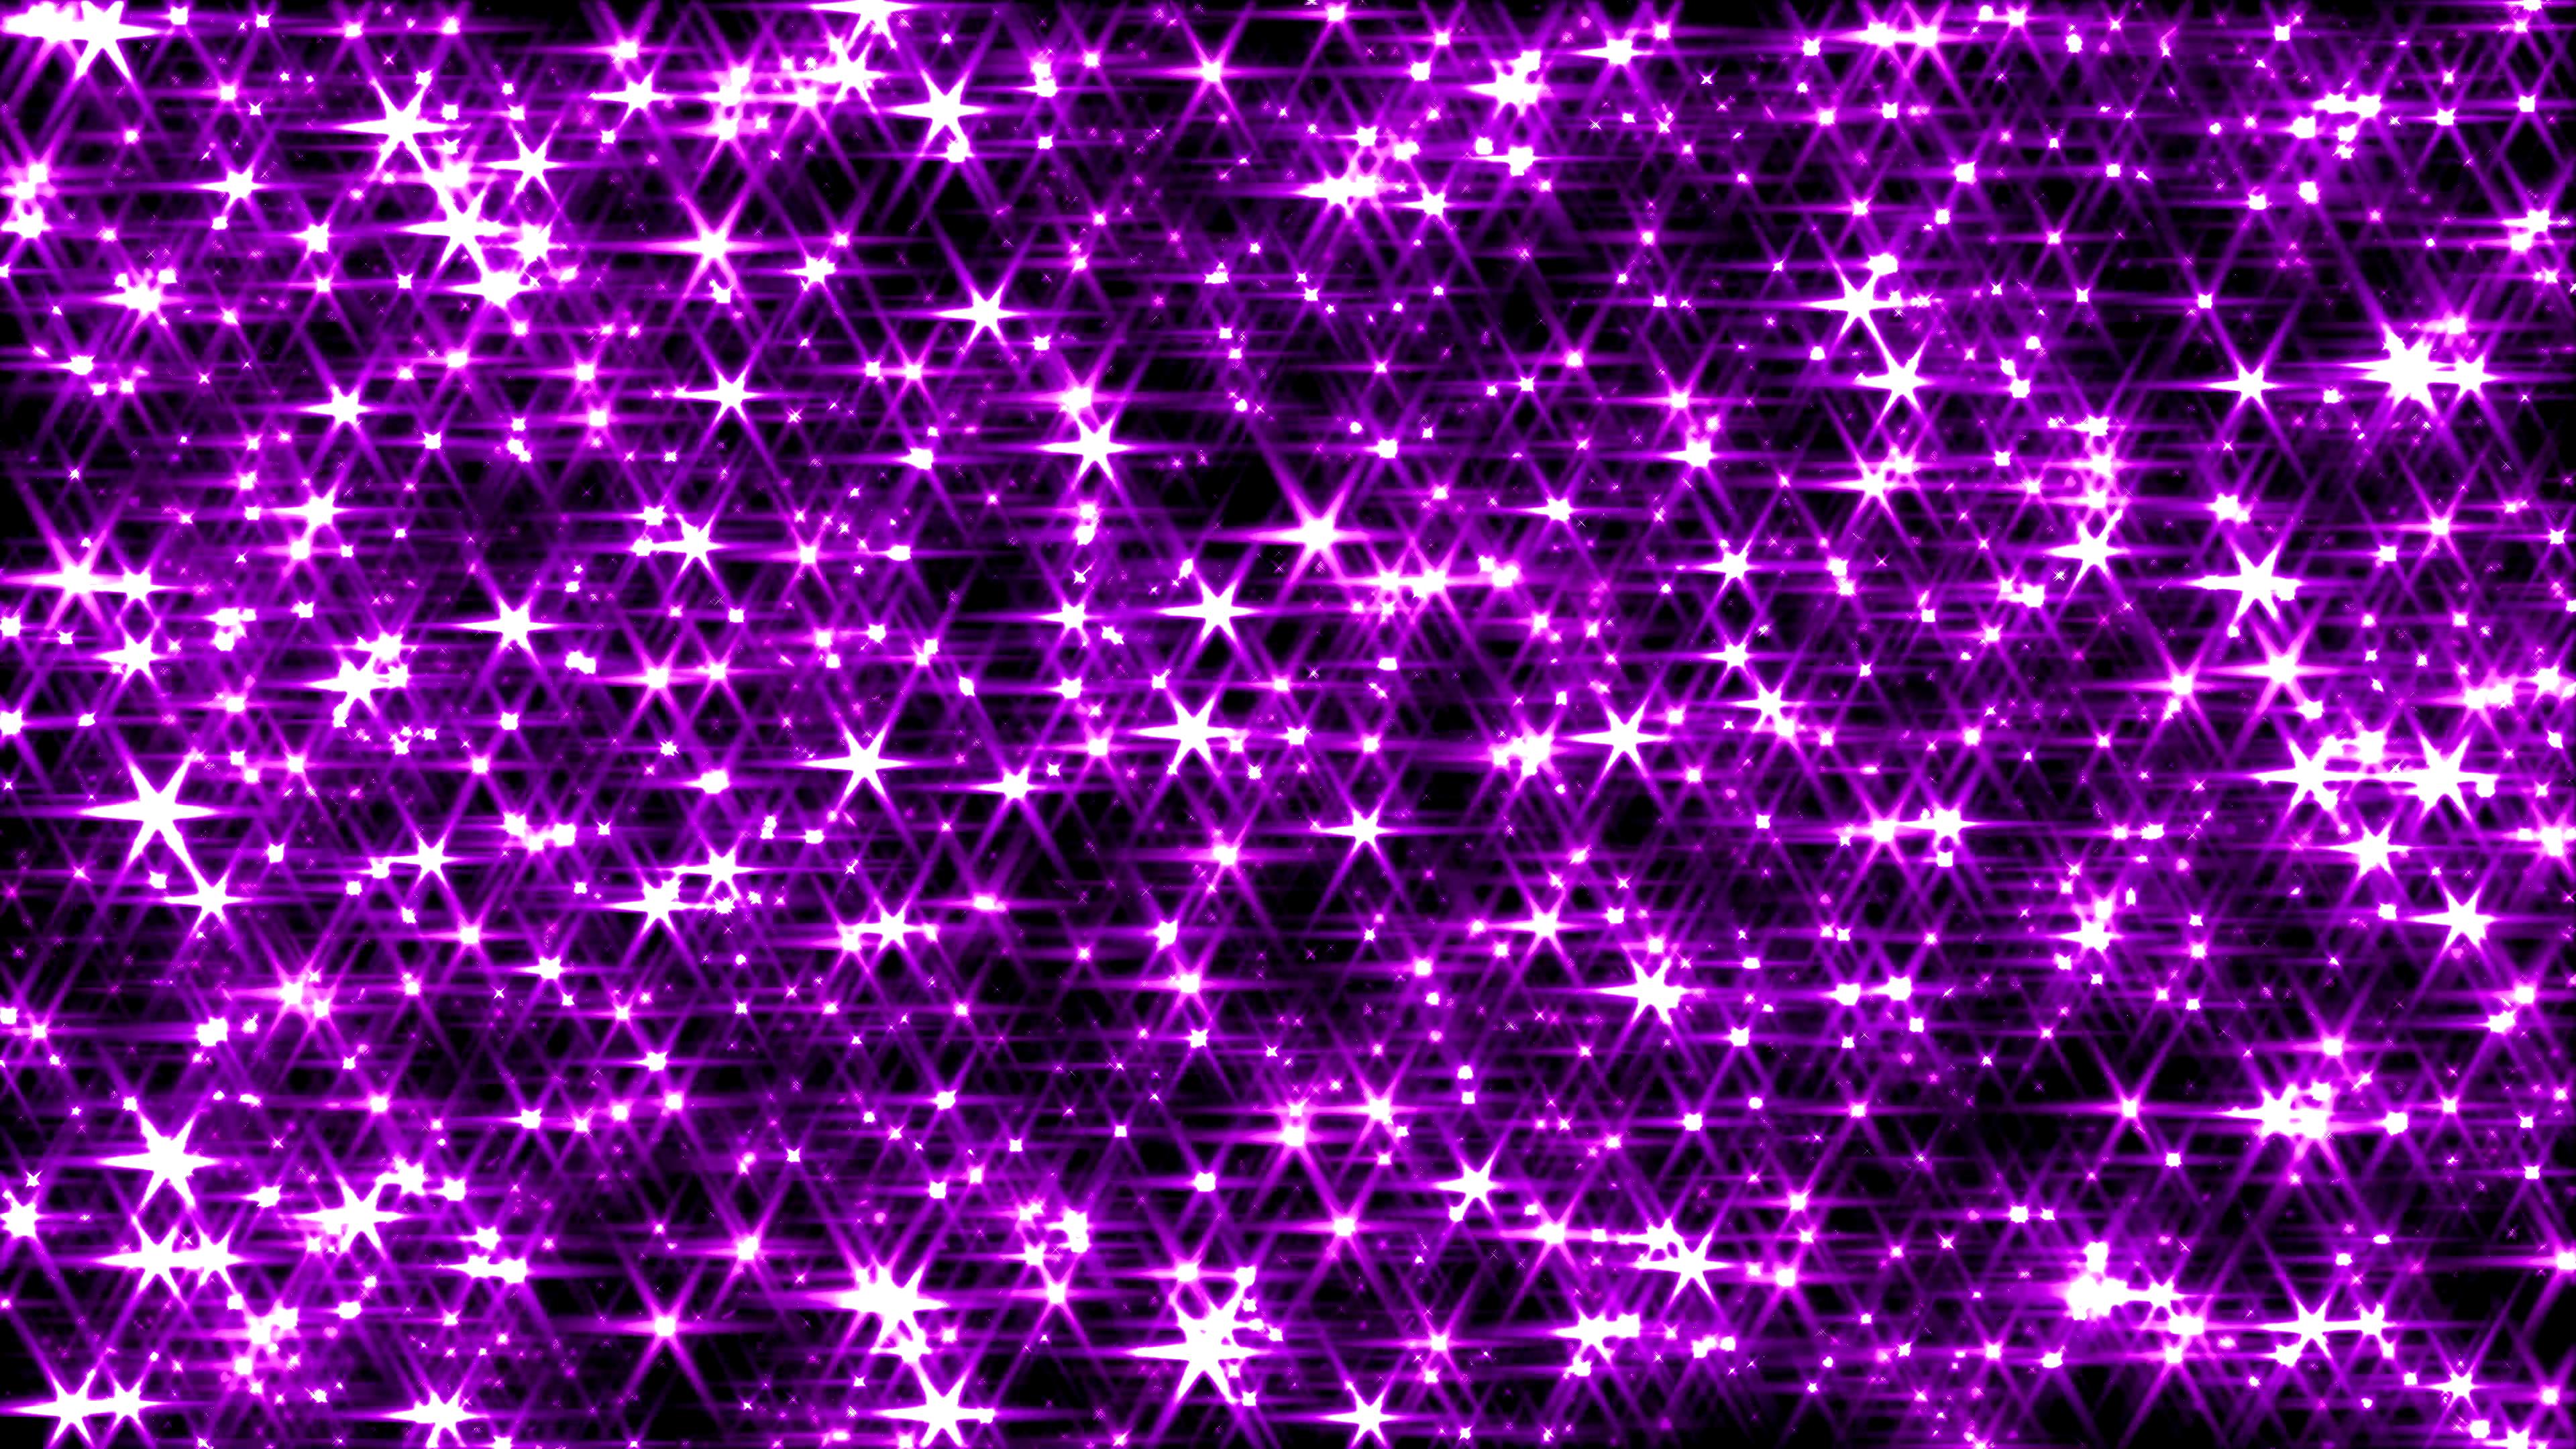 Royalty-Free HD Glitter Background Loop - VideoBlocks